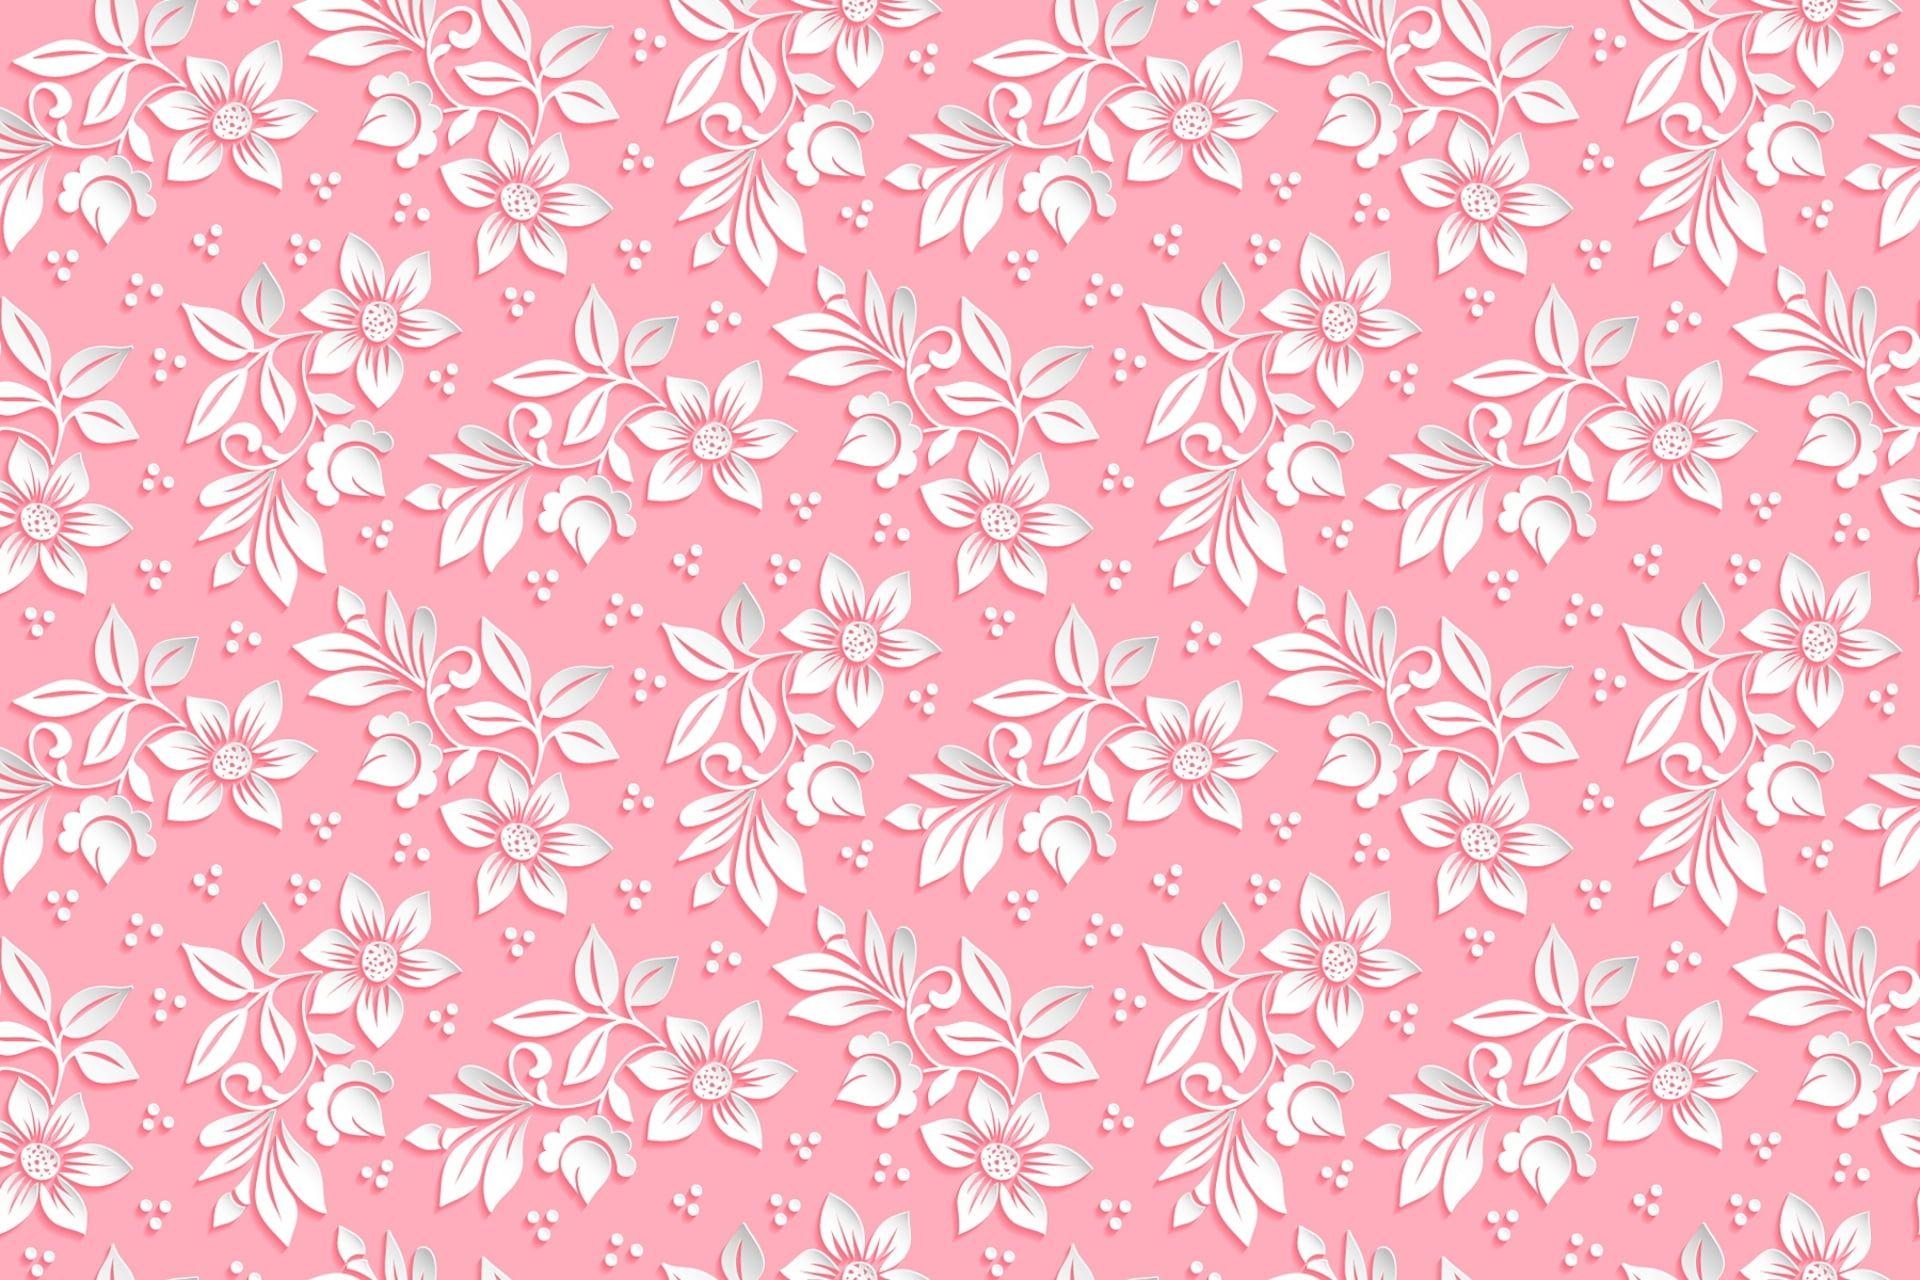 White Petaled Flowers Wallpaper Flowers Background Pink Pattern The Volume 1080p Wallpaper Hdwallpape Flower Wallpaper Wallpaper Mobile Legend Wallpaper